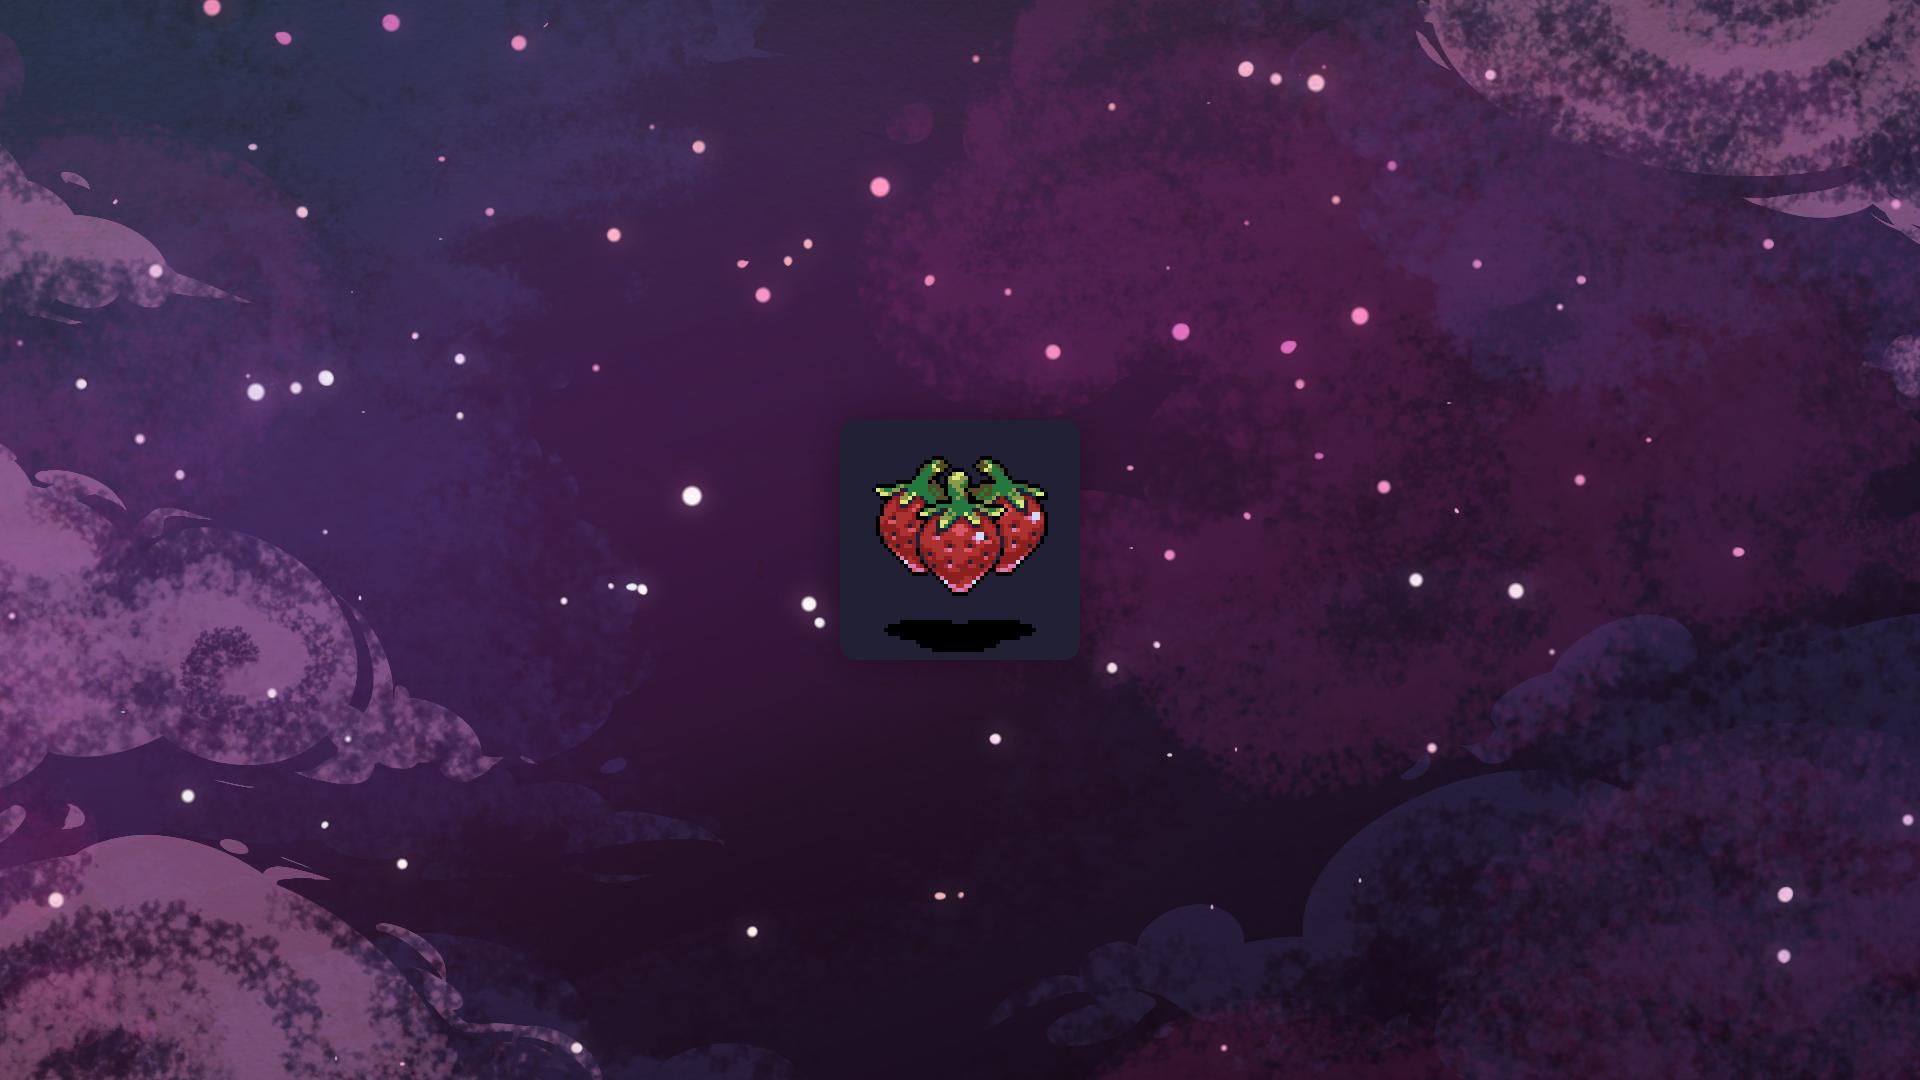 Strawberry Medal